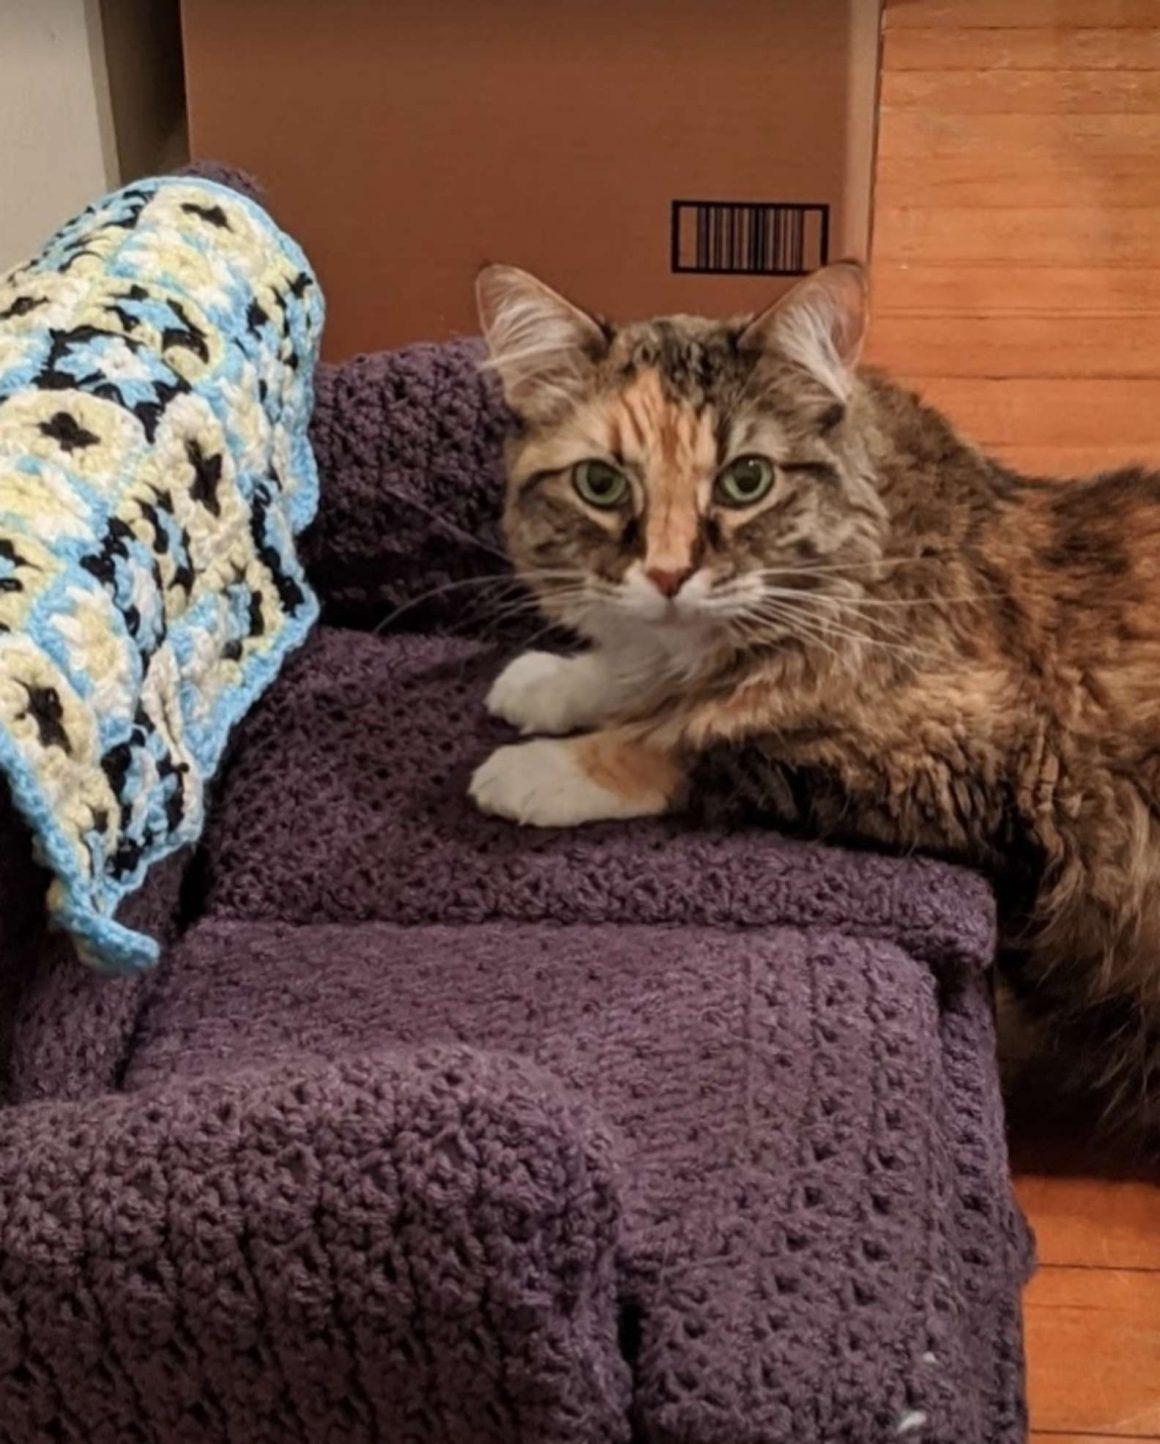 kucing di atas sofa rajutan